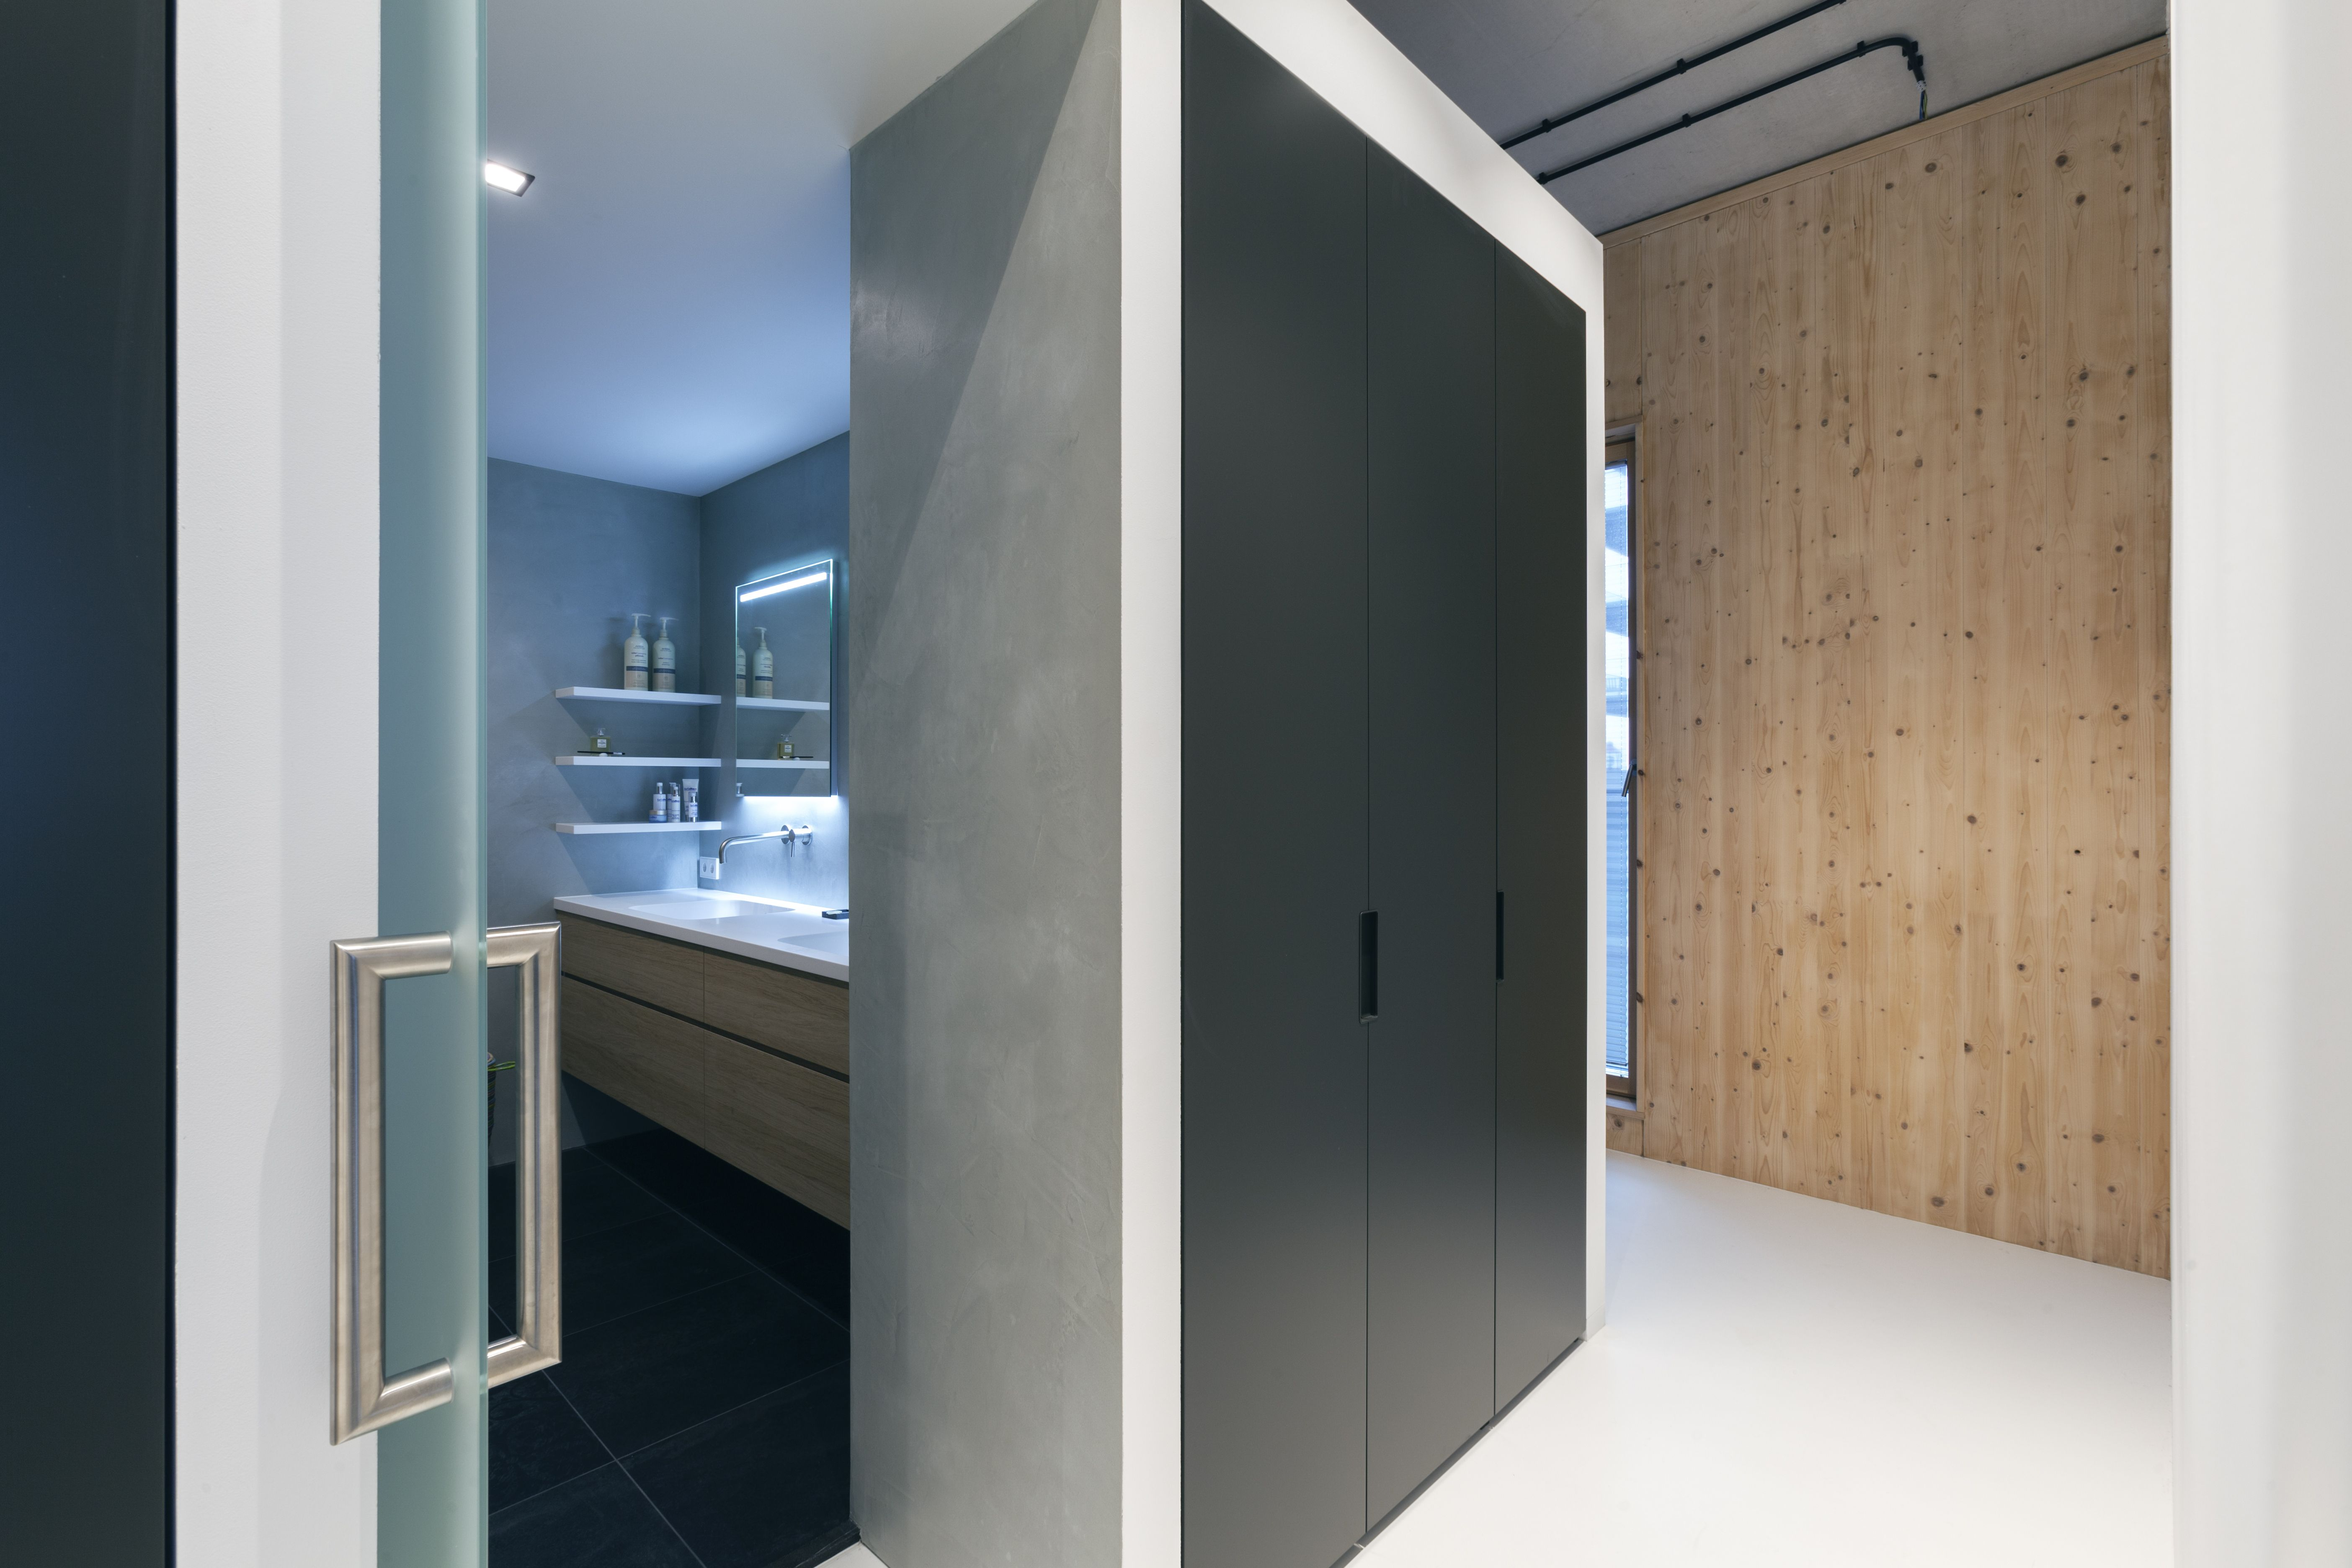 Strakke Badkamer Wanden : Inkijkje vanuit inloopkast naar strakke badkamer met deur van mat